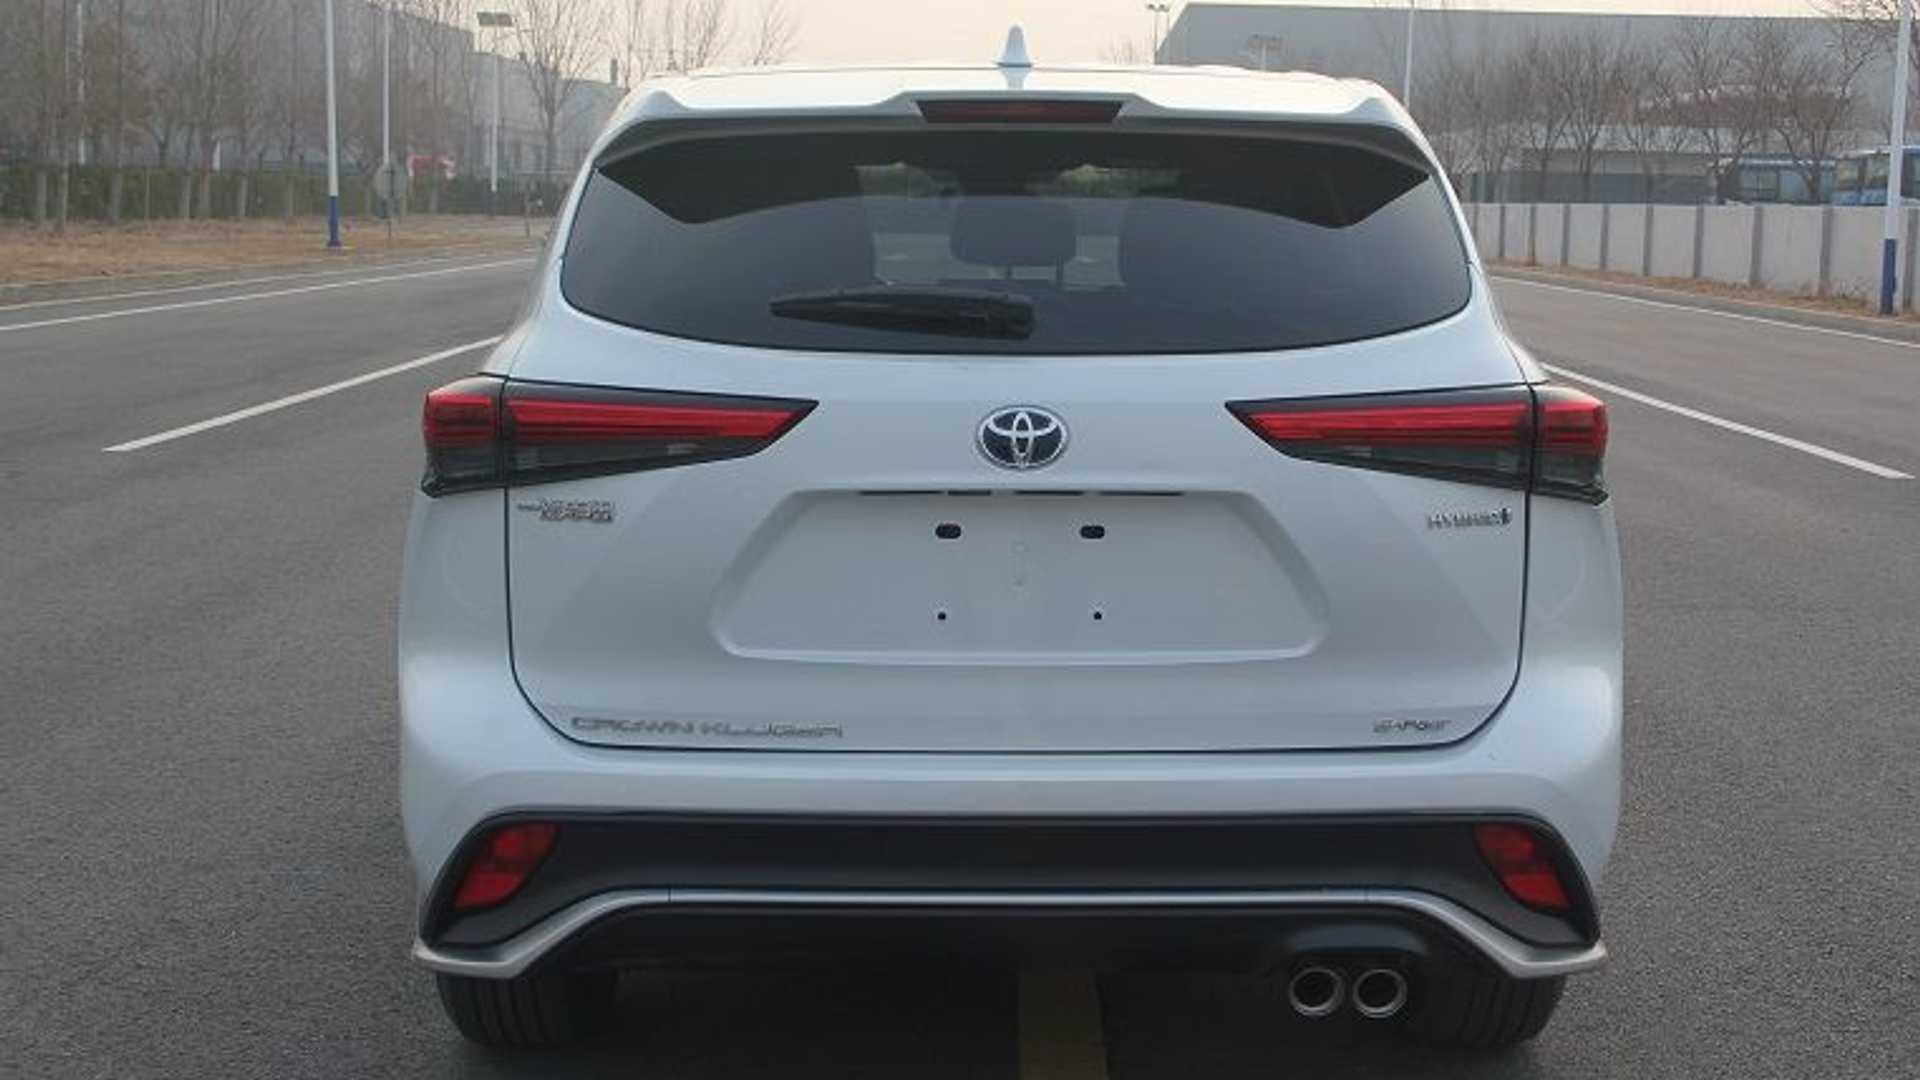 Toyota-Crown-Kugler-SUV-6